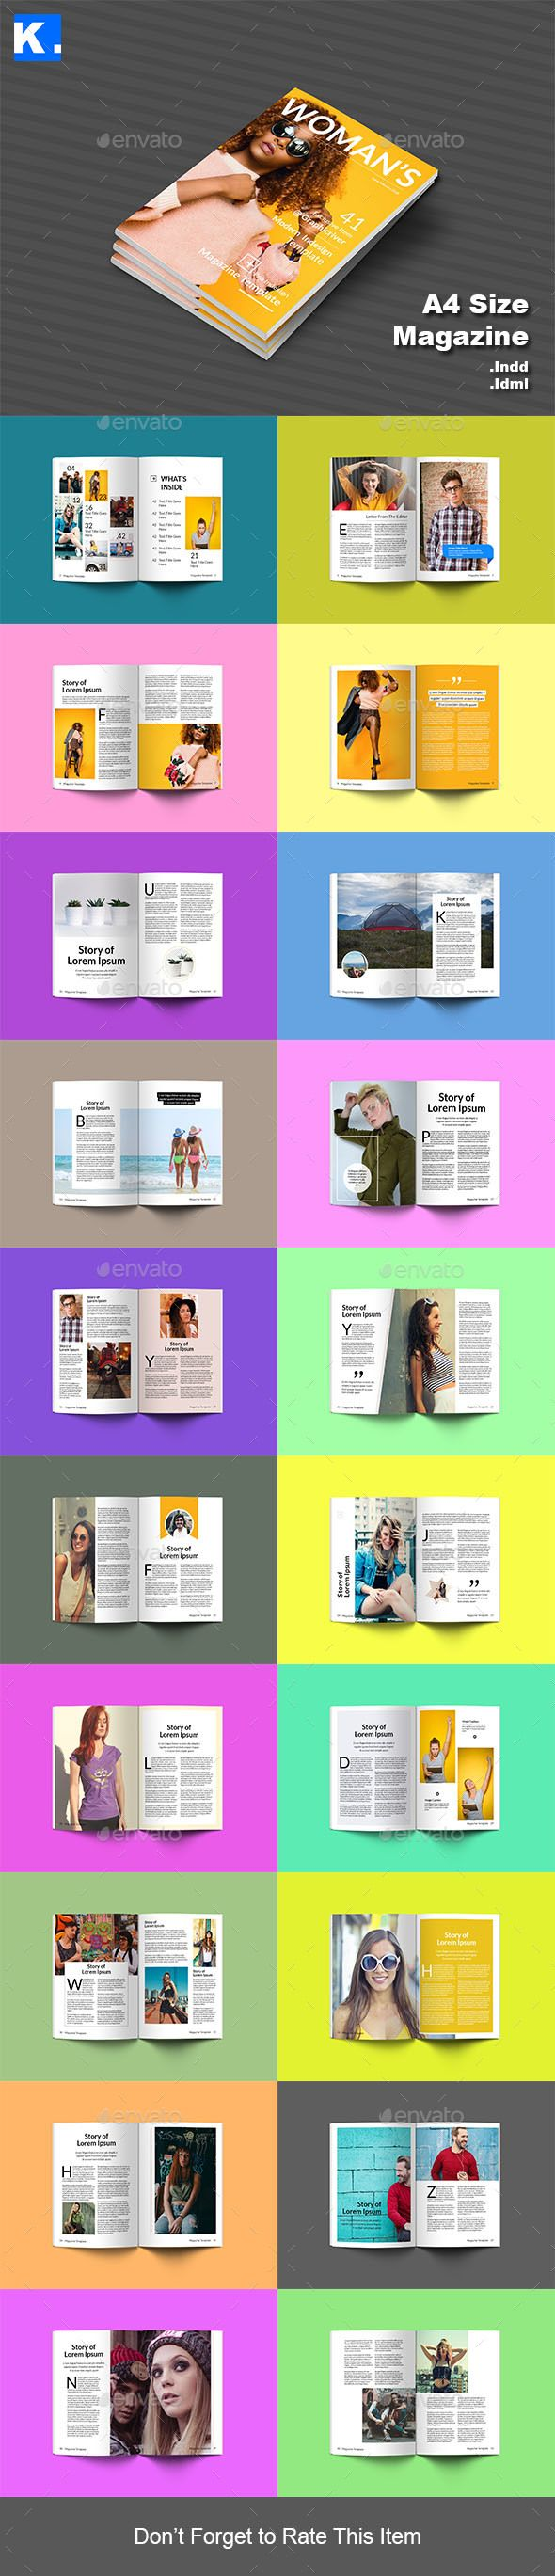 Indesign Magazine Template 8 | Indesign magazine templates, Template ...